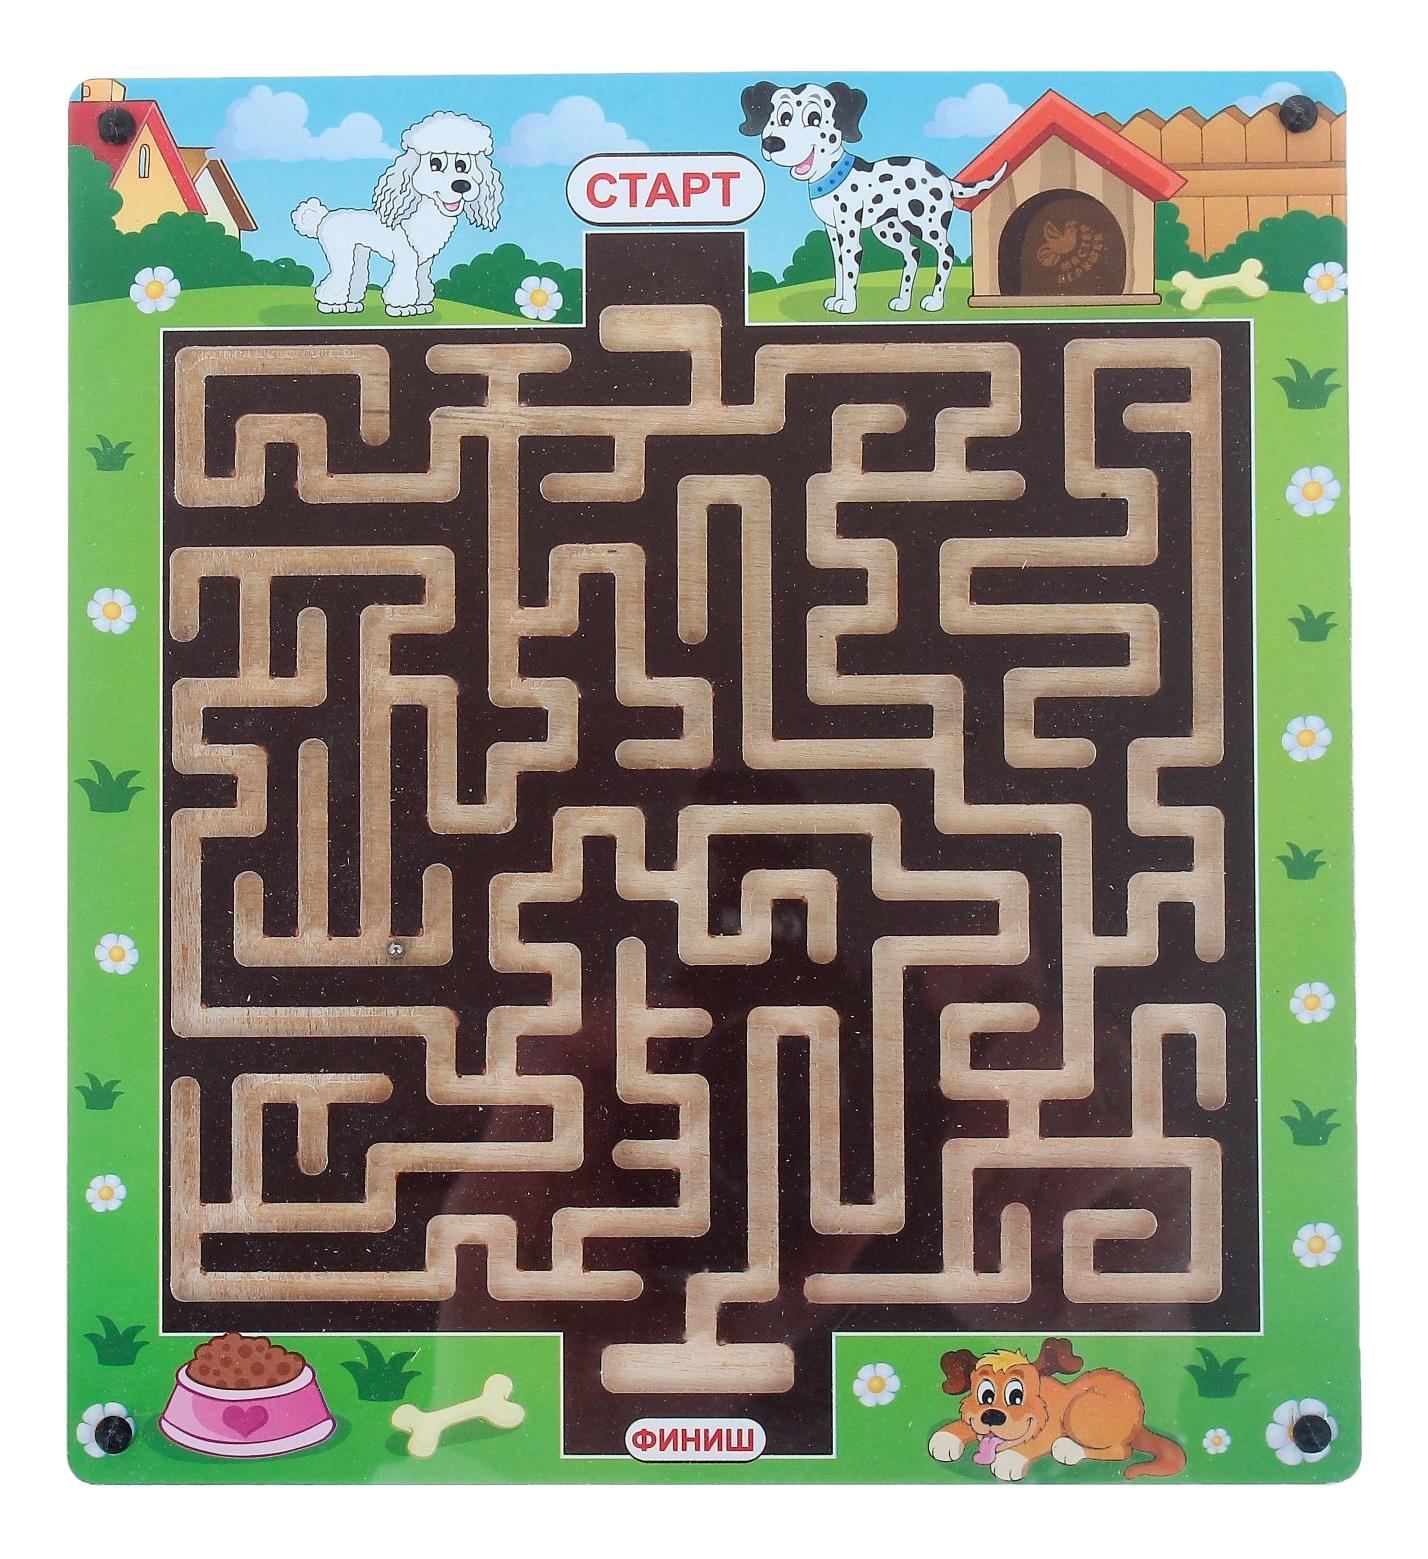 Купить Лабиринт Собачки, Головоломка Мастер игрушек Лабиринт с шариком Собачки, Игрушки головоломки